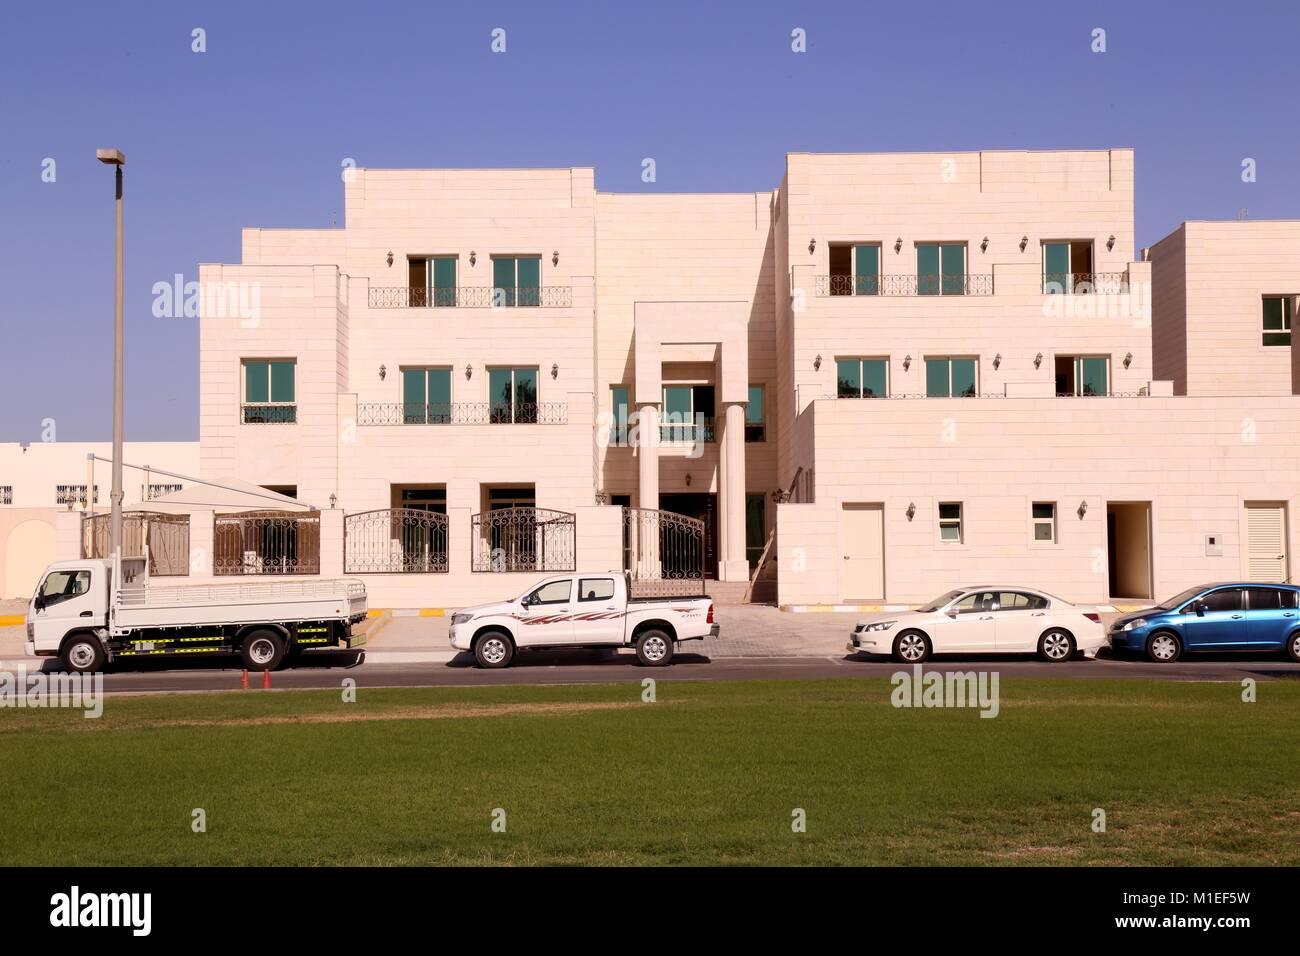 Contemporary Villa with Natural Stone Cladding - Shot from Dubai - Stock Image